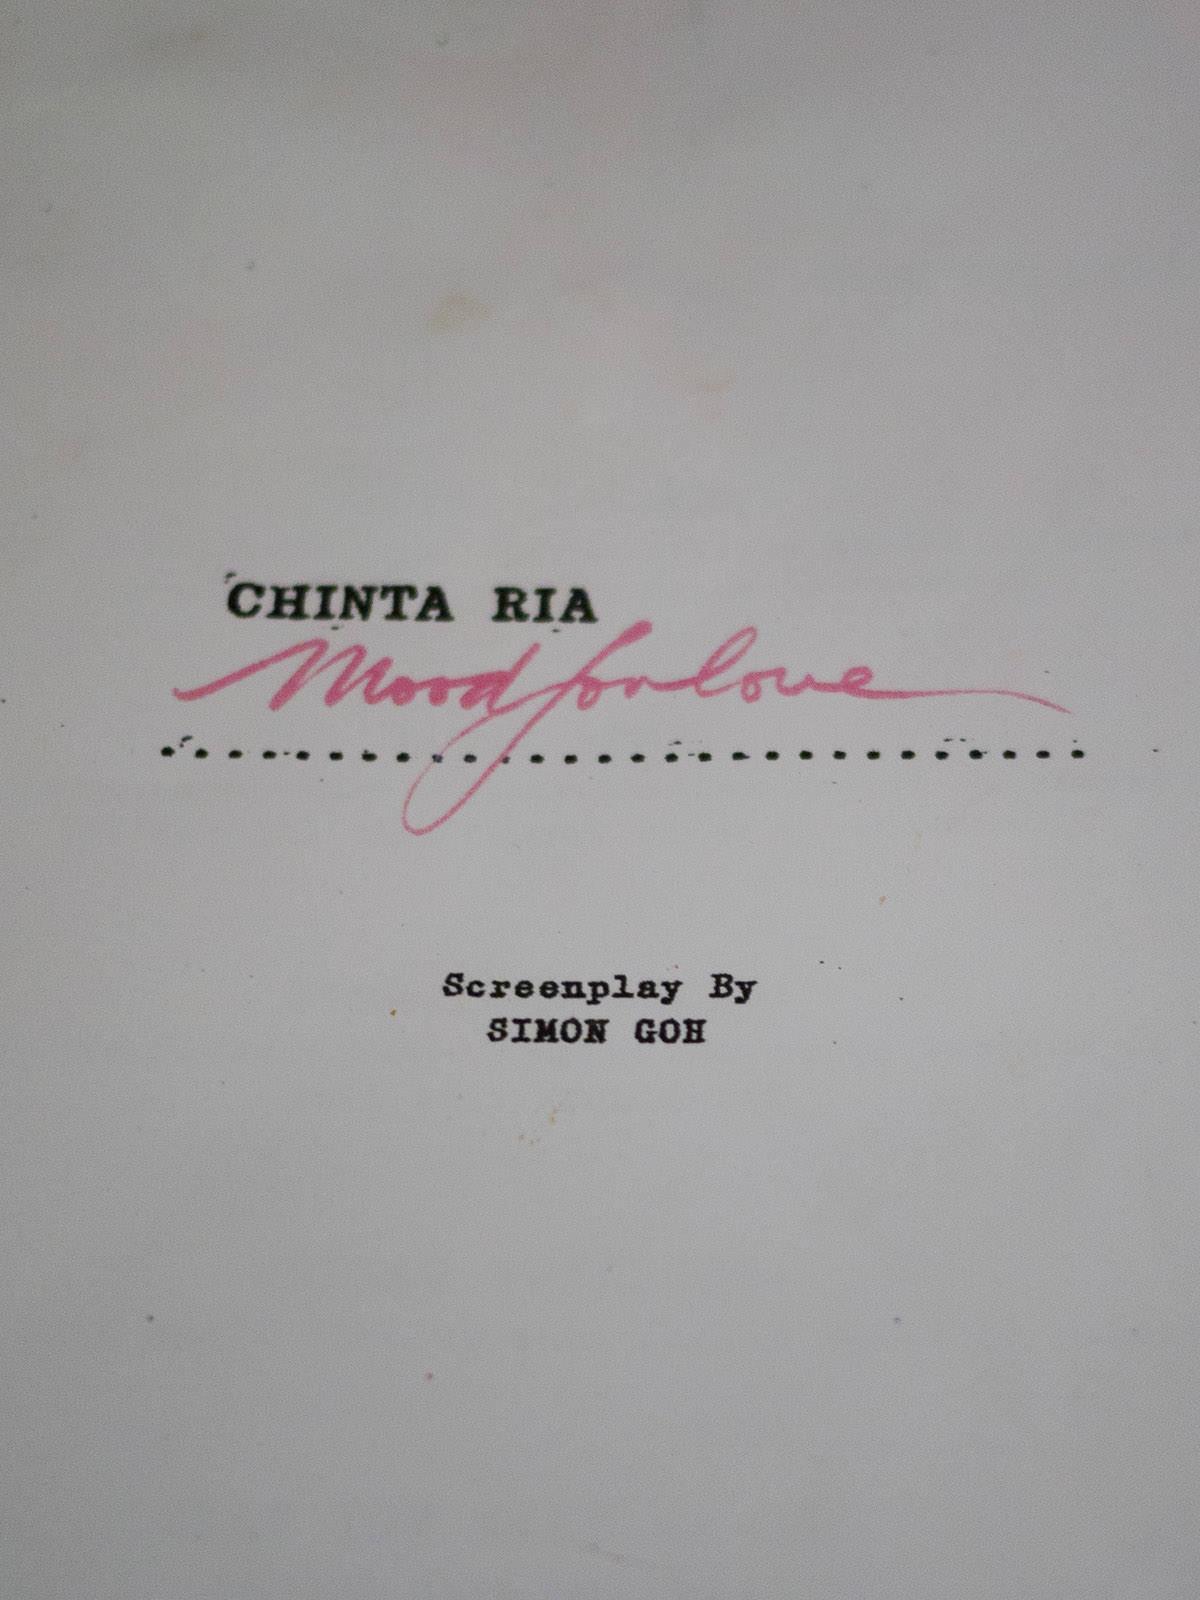 Chinta Ria... Mood for Love menu